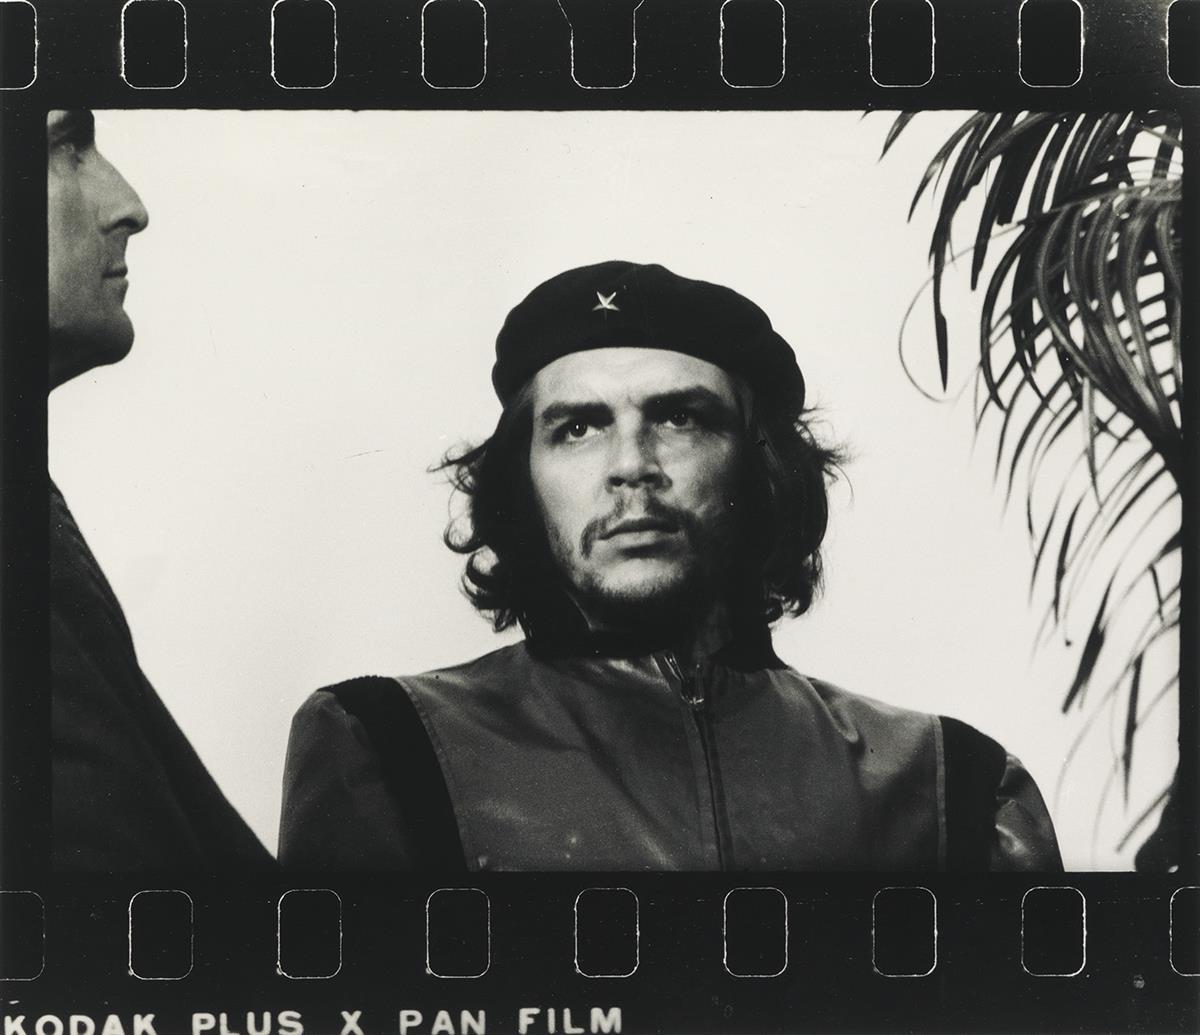 ALBERTO-KORDA-(1928-2001)-Guerrillero-Heroico-(Che-Guevara)